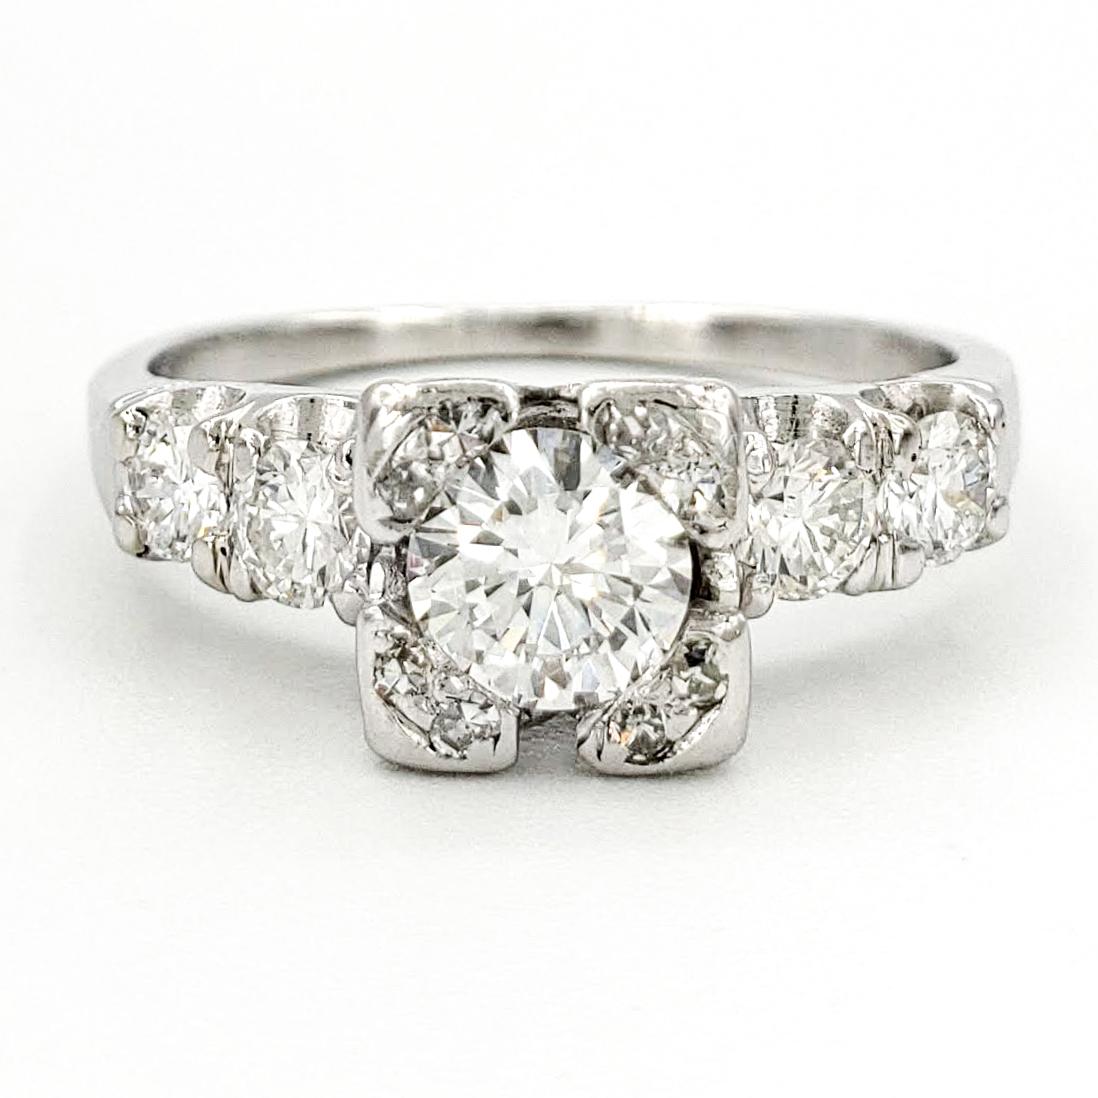 vintage-platinum-engagement-ring-with-0-38-carat-round-brilliant-cut-diamond-egl-e-si1